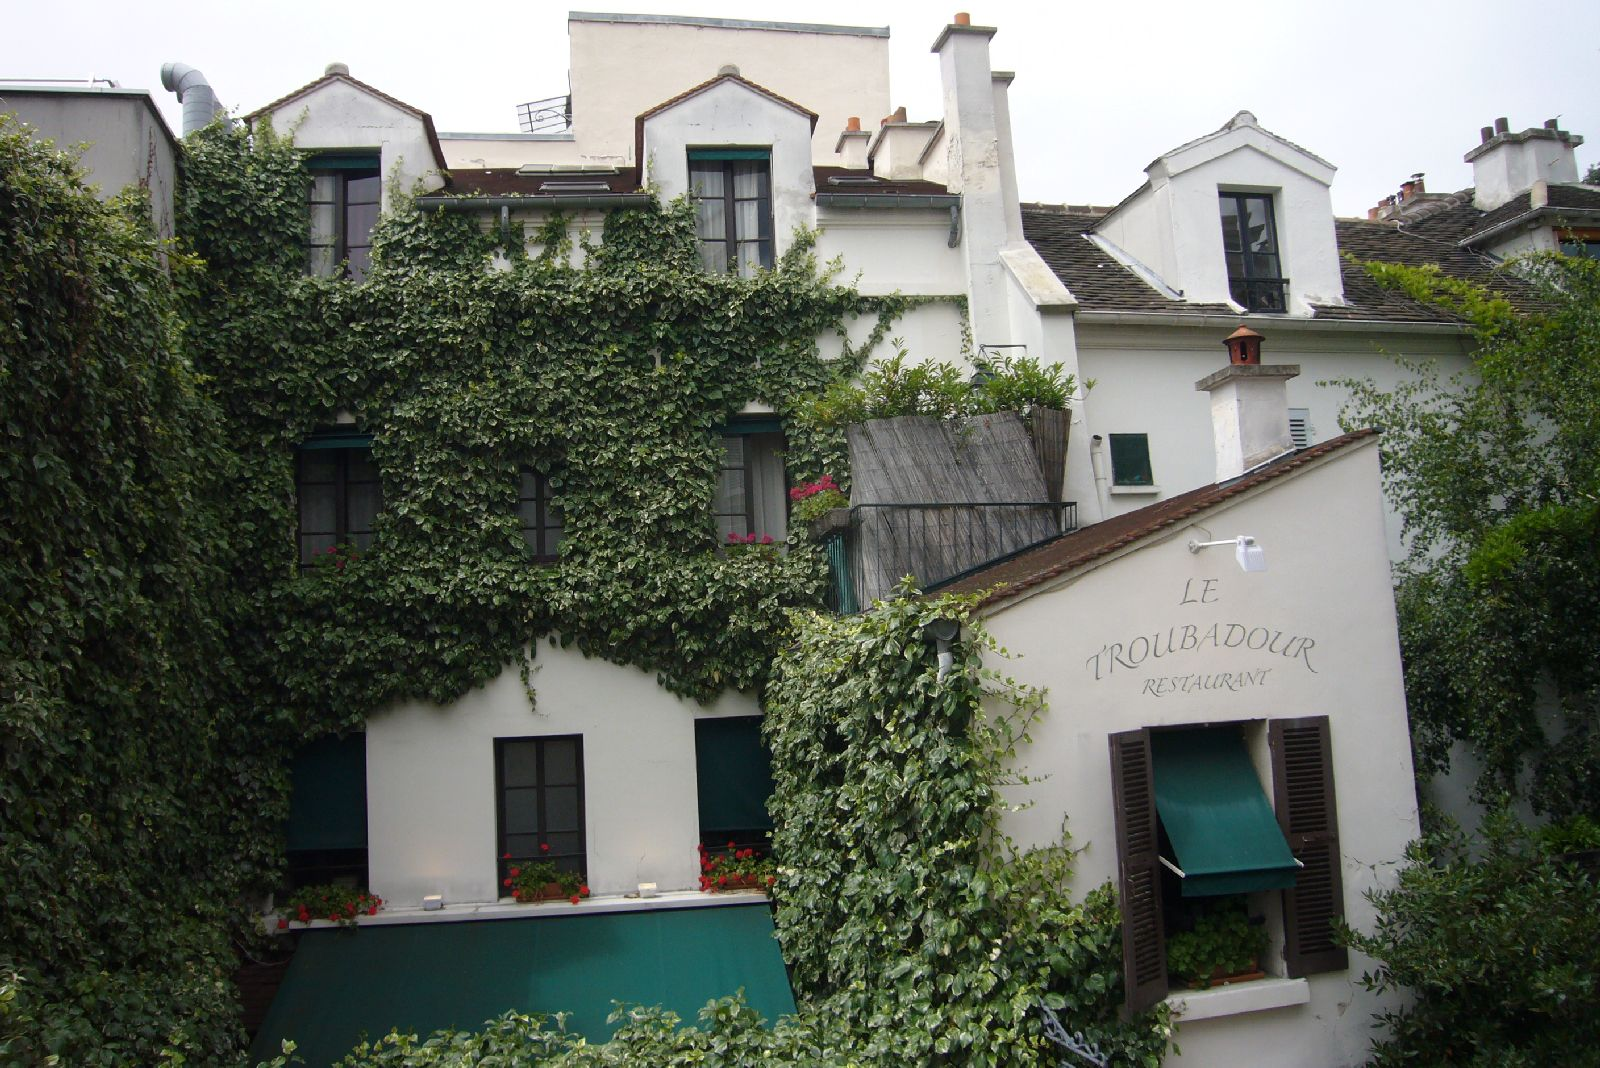 monmartre-2012_trubadur